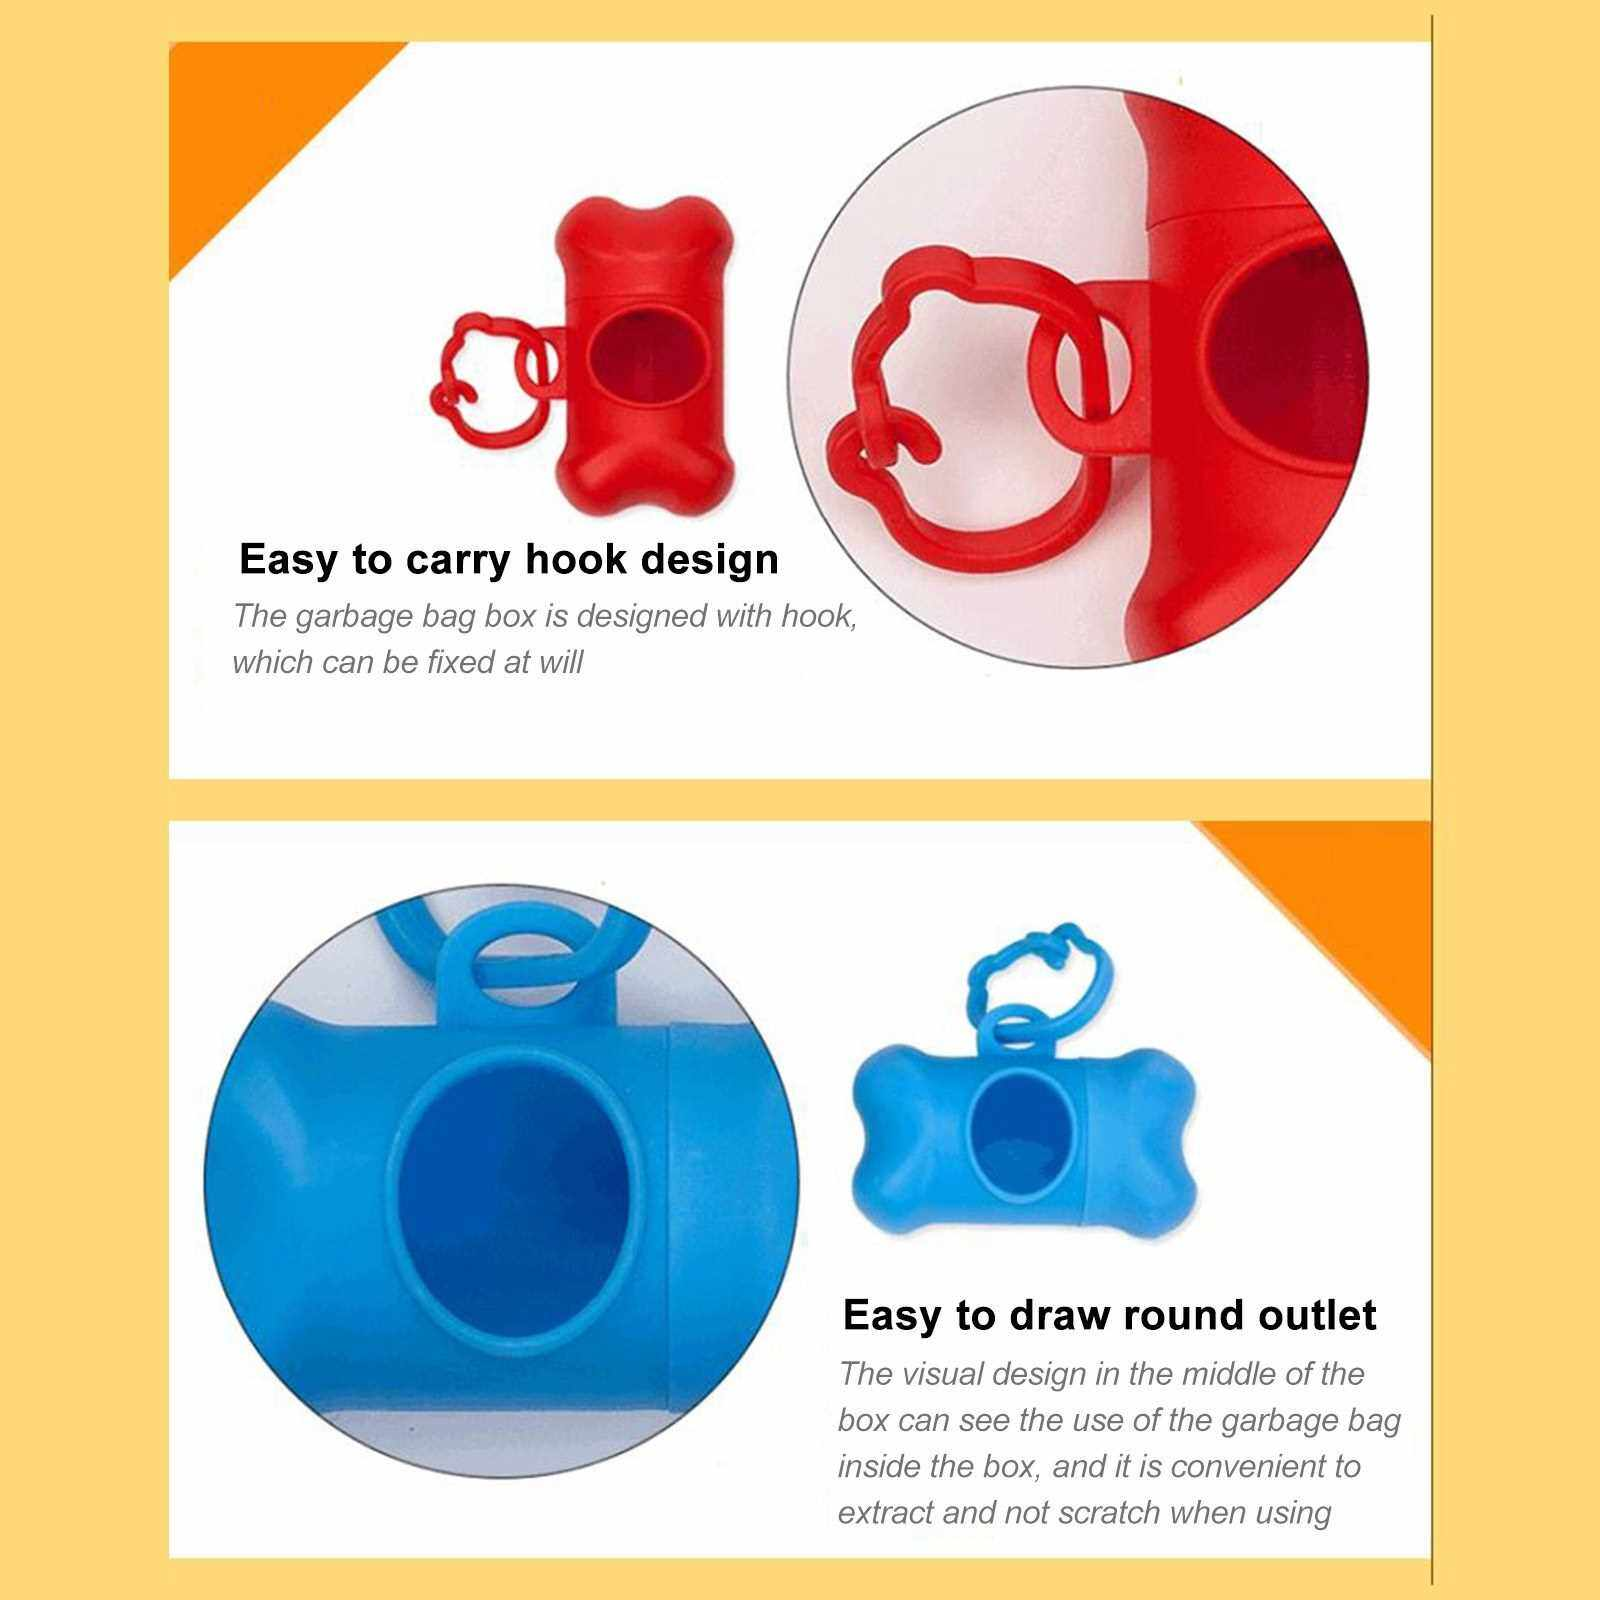 Pet Poop Bag Dispenser Box - Includes 1 Roll (15 Dog Poop Bags) - Scented, Leak-Proof, Earth-Friendly Poop Bags for Dogs (Black)